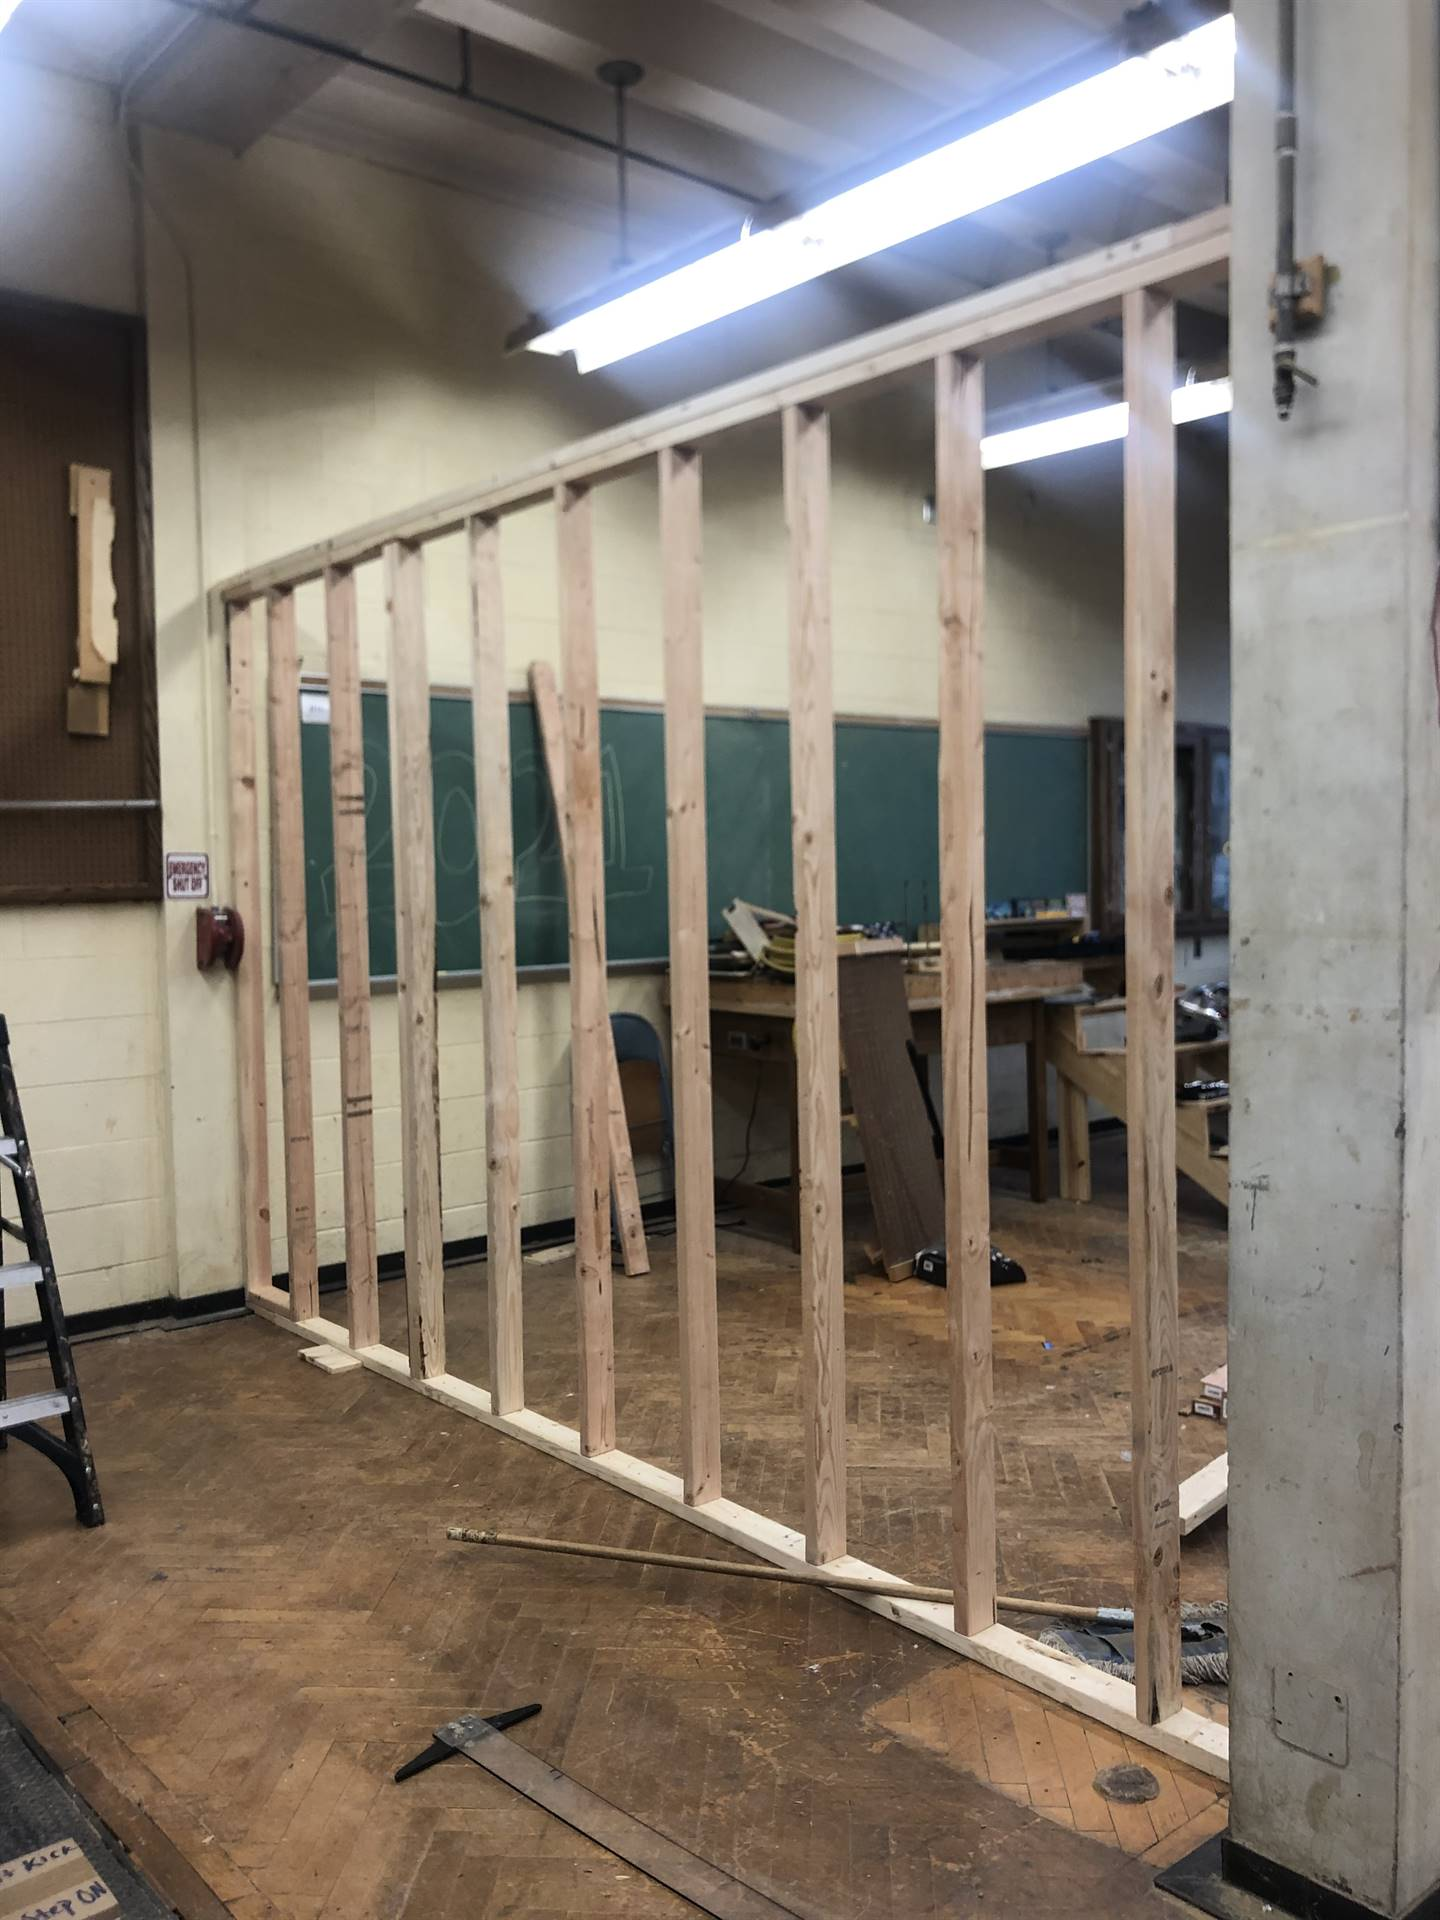 WicKloset Renovations - 12/18/2020